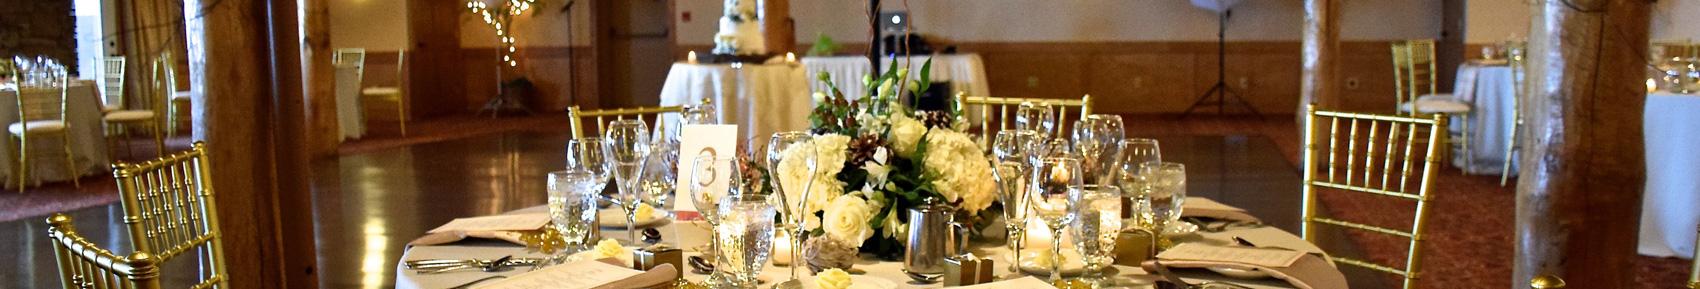 alpine-room-reception